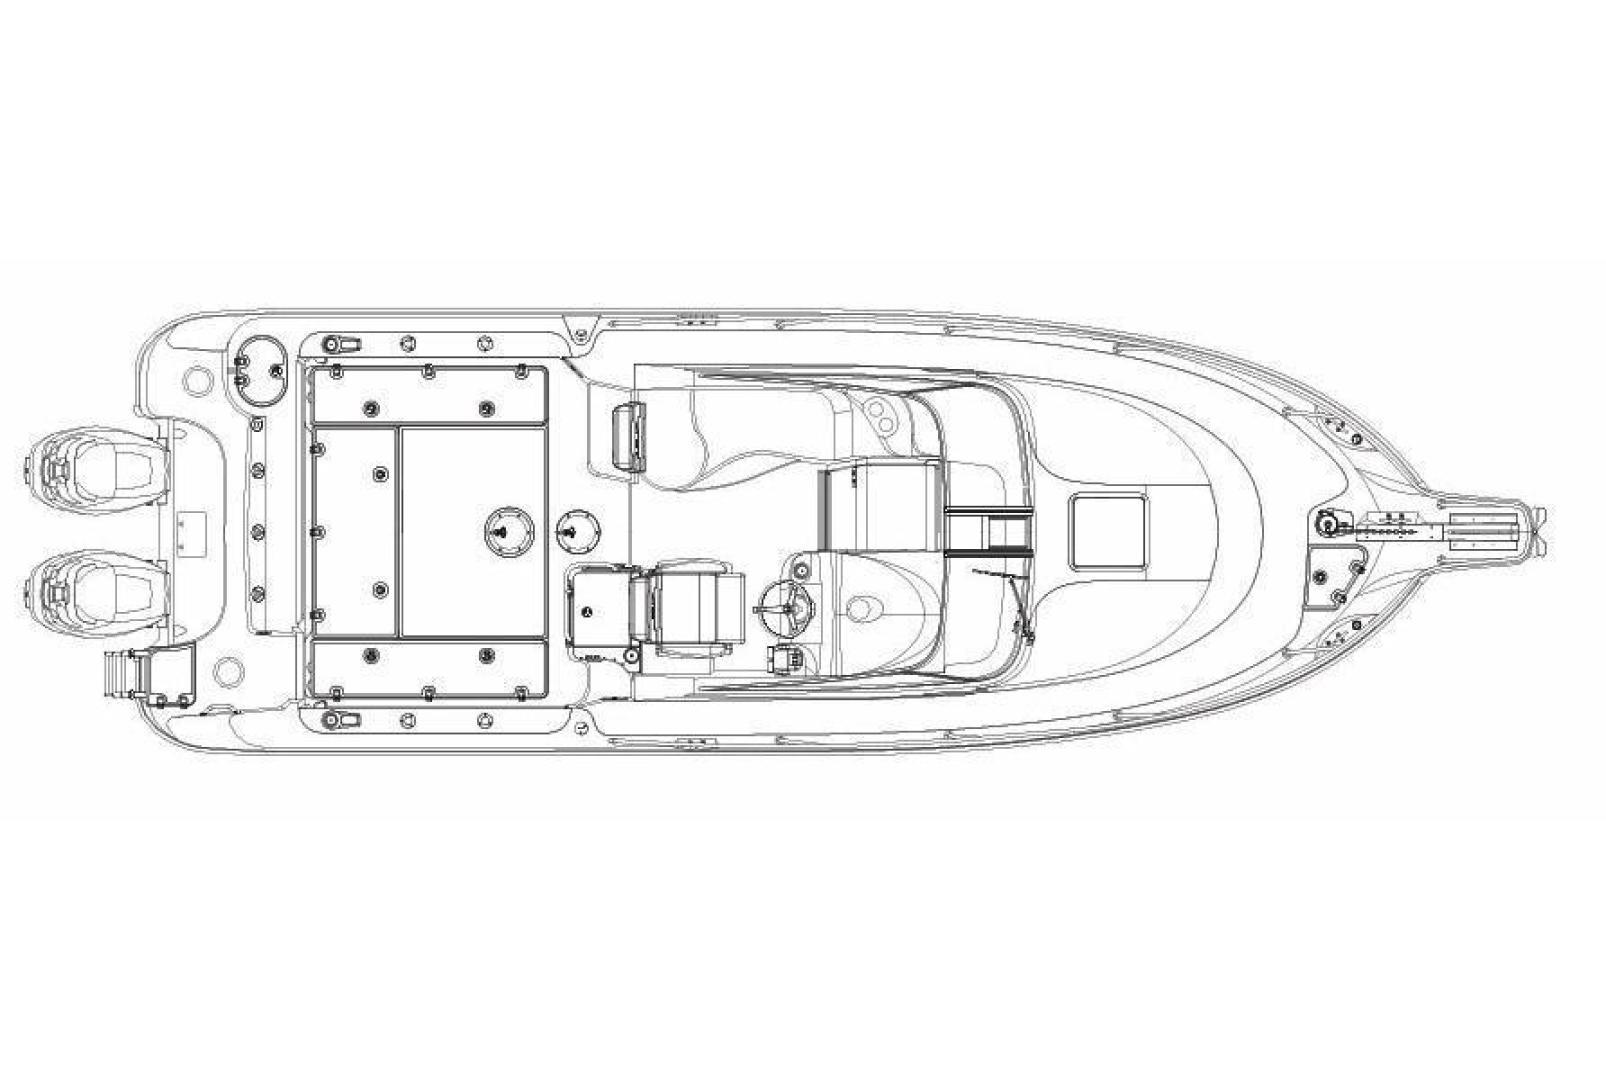 Boston Whaler-285 Conquest 2014 -Sarasota-Florida-United States-1345518 | Thumbnail